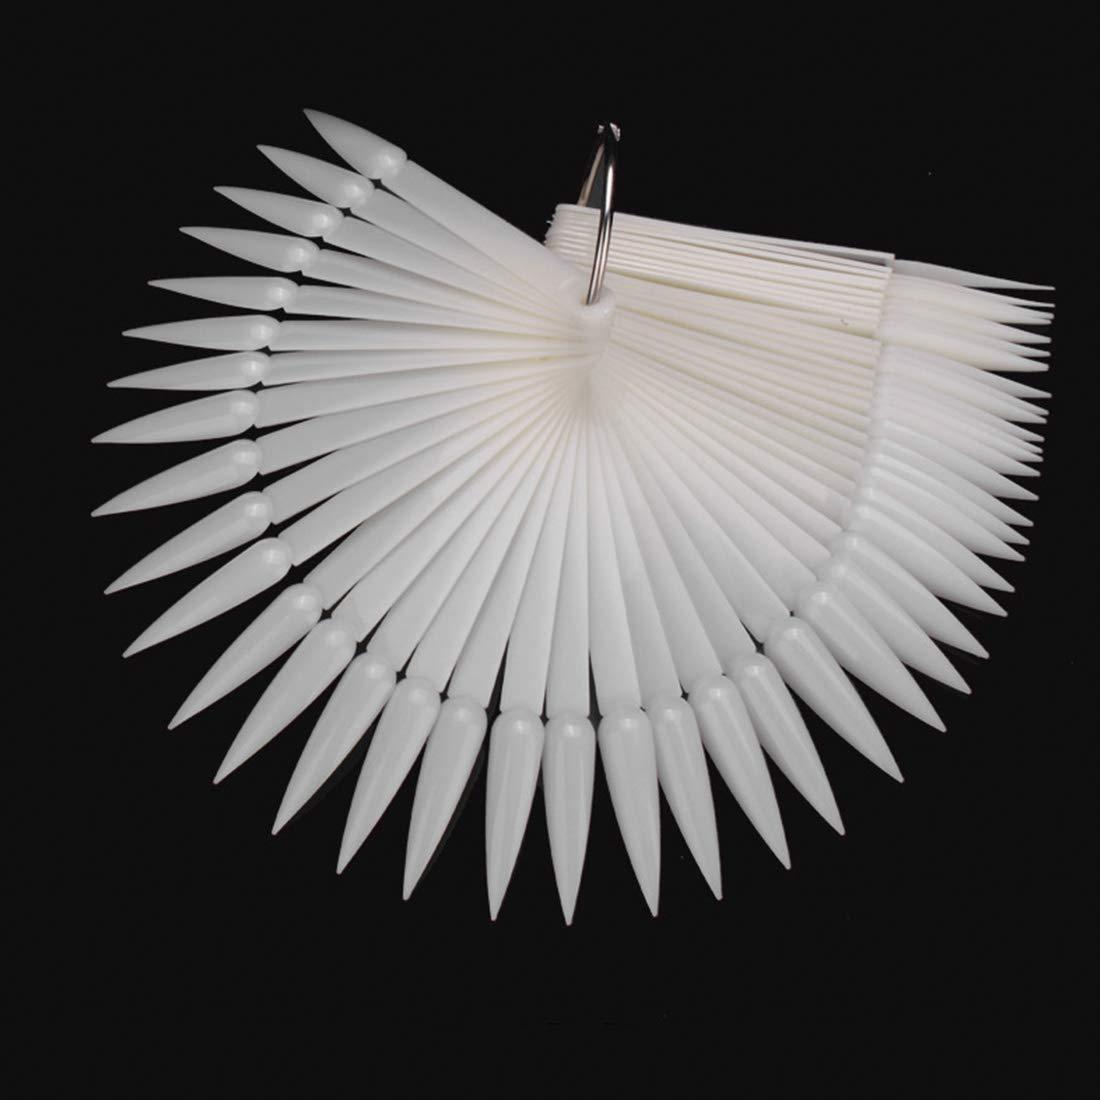 50pcs Stiletto False Nail Art Fan Wheel Practice Board Tip Sticks for Dipping Powder Colors UV Gel Nail Polish Display Chart, HJ-NT069-Natural